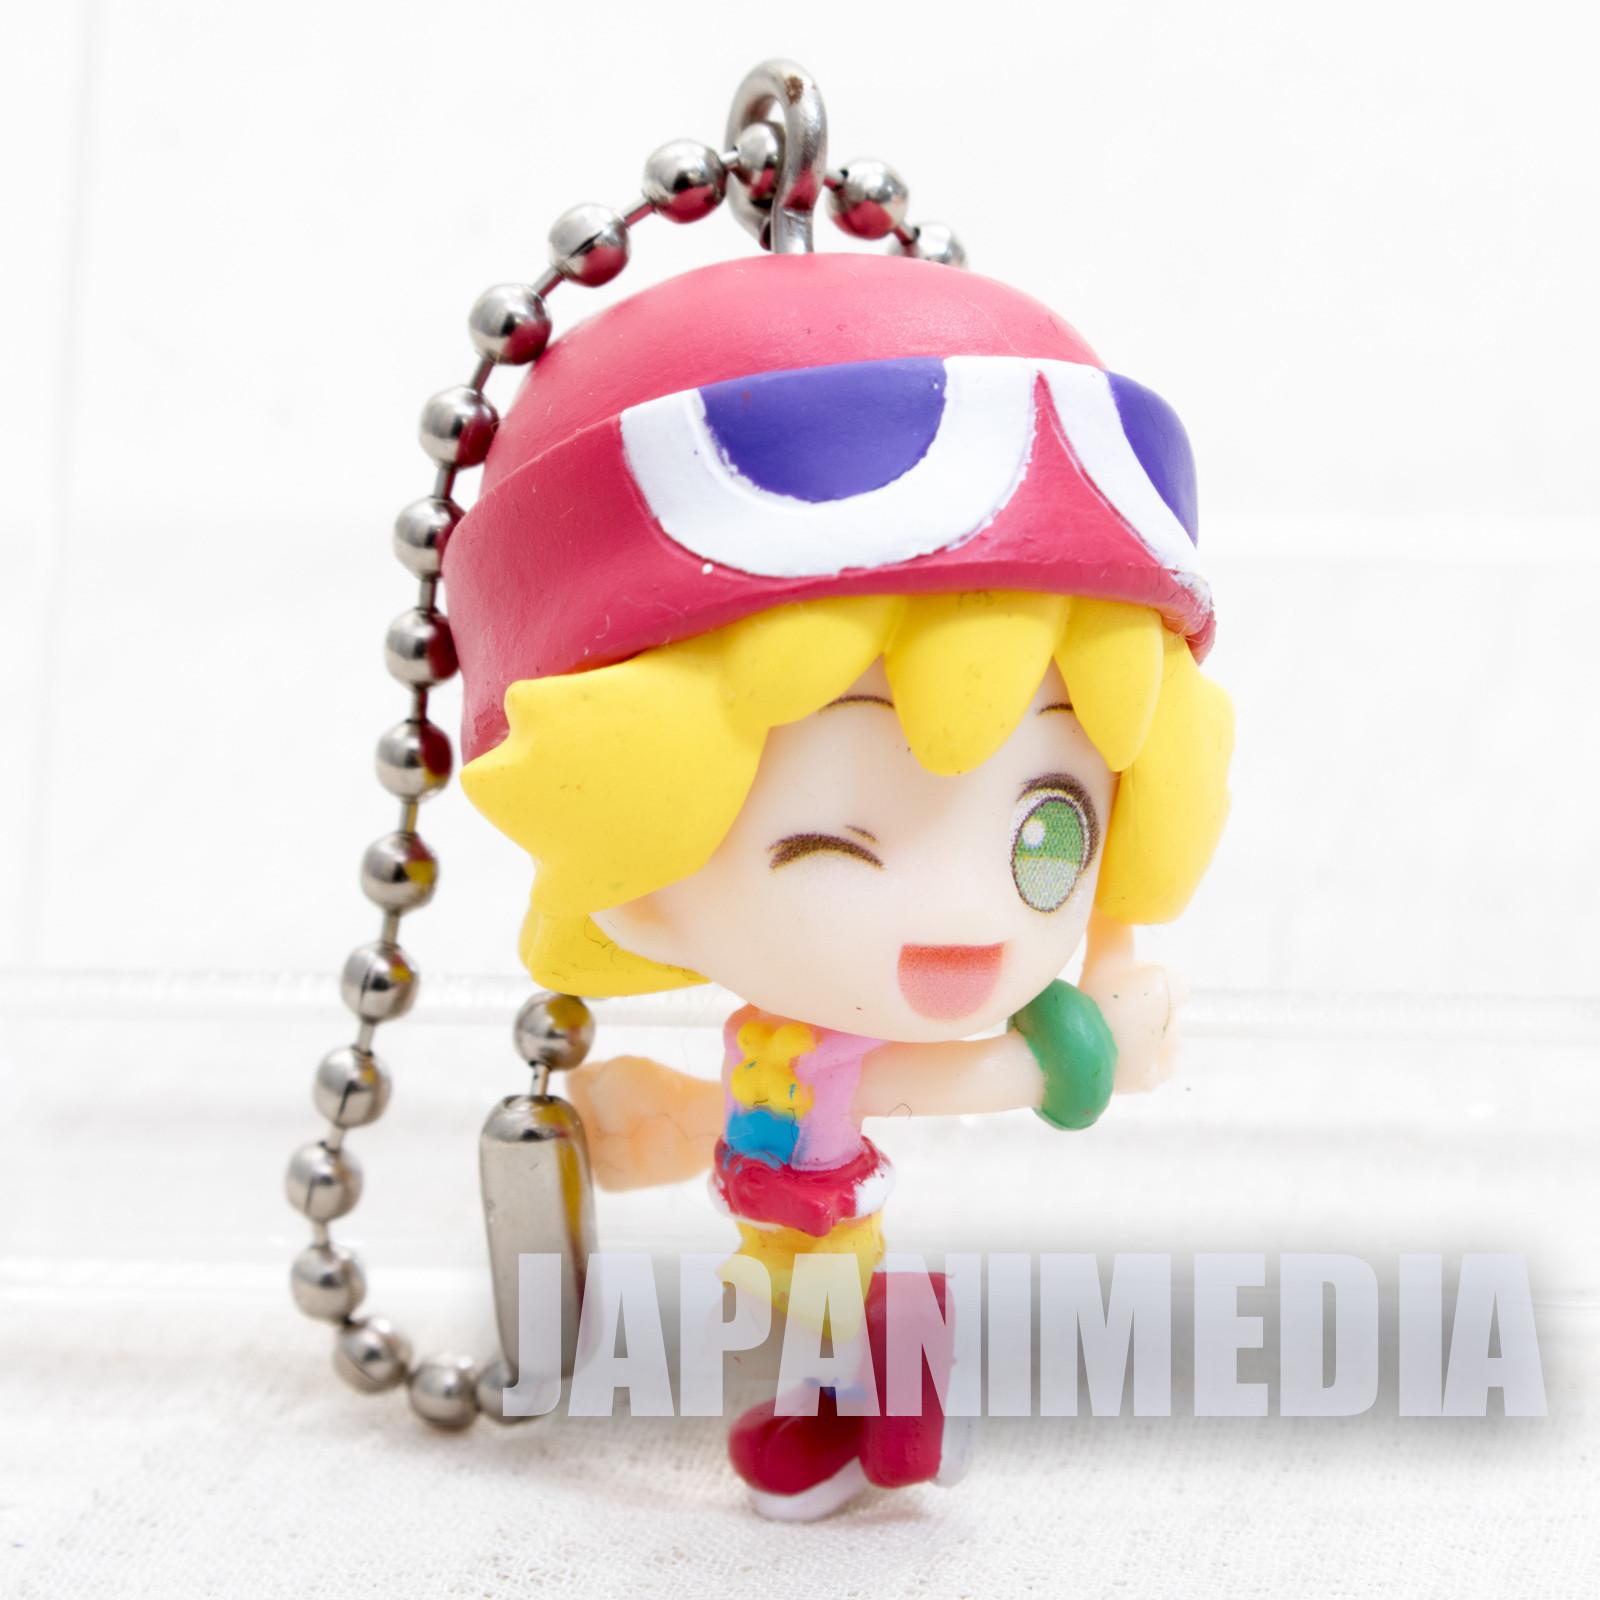 Puyopuyo!! Quest Amitie Swing Figure Ball Keychain JAPAN GAME SEGA